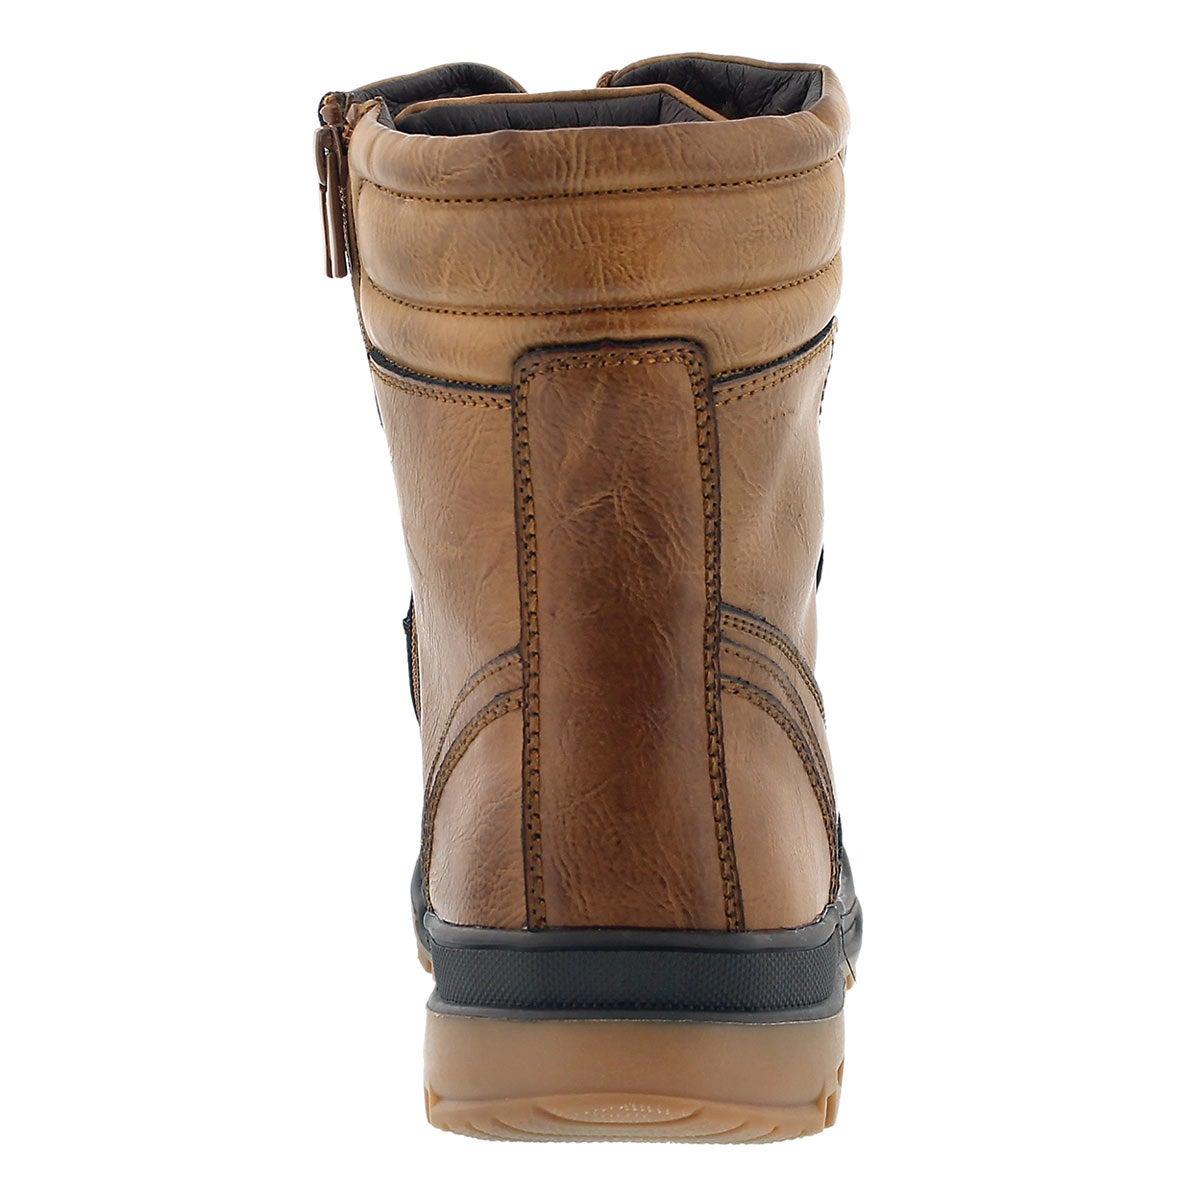 Mns Yan camel wtrpf winter boot